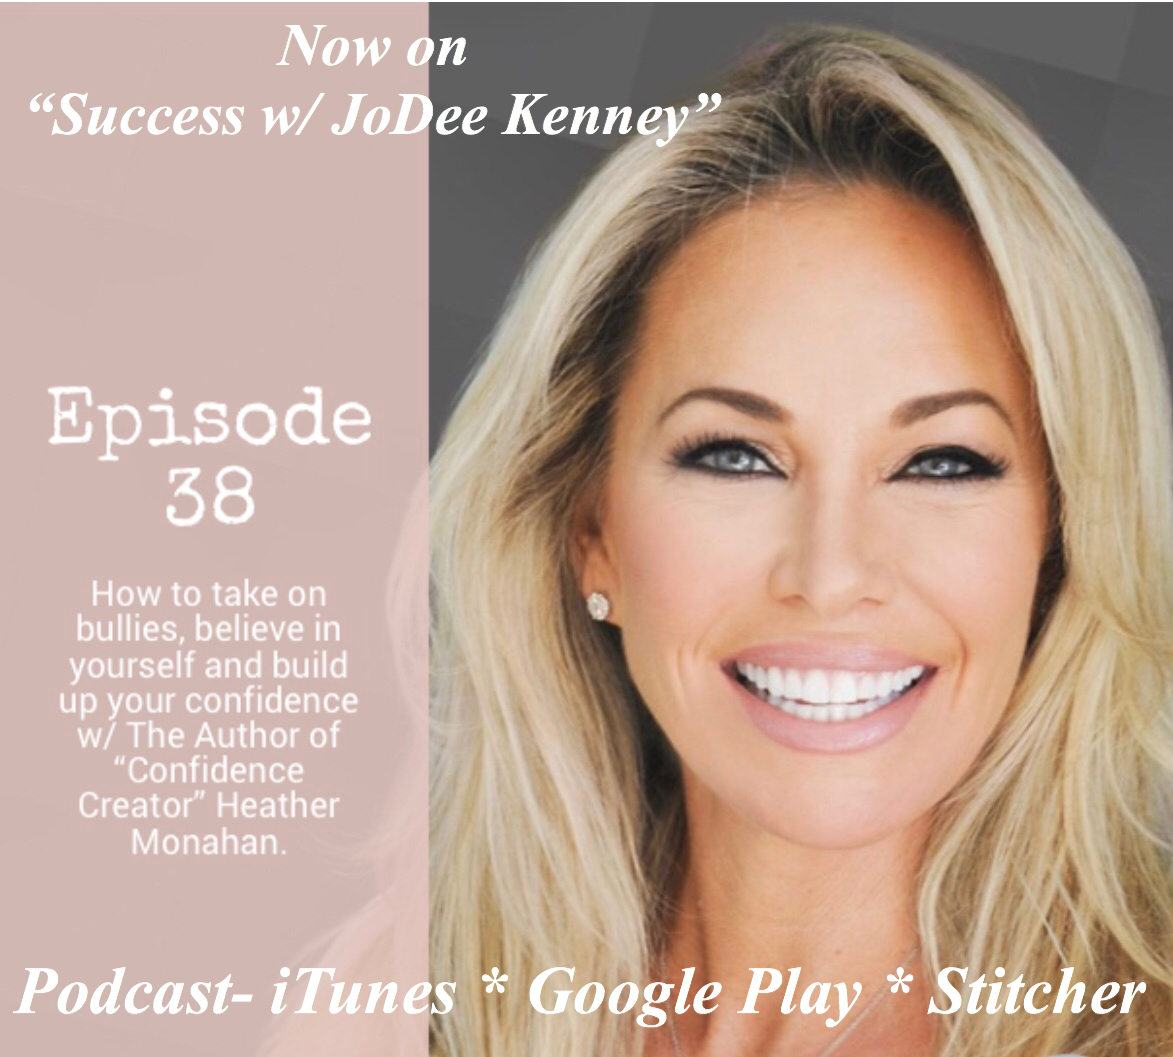 Jodee Kenny interviews Heather Monahan